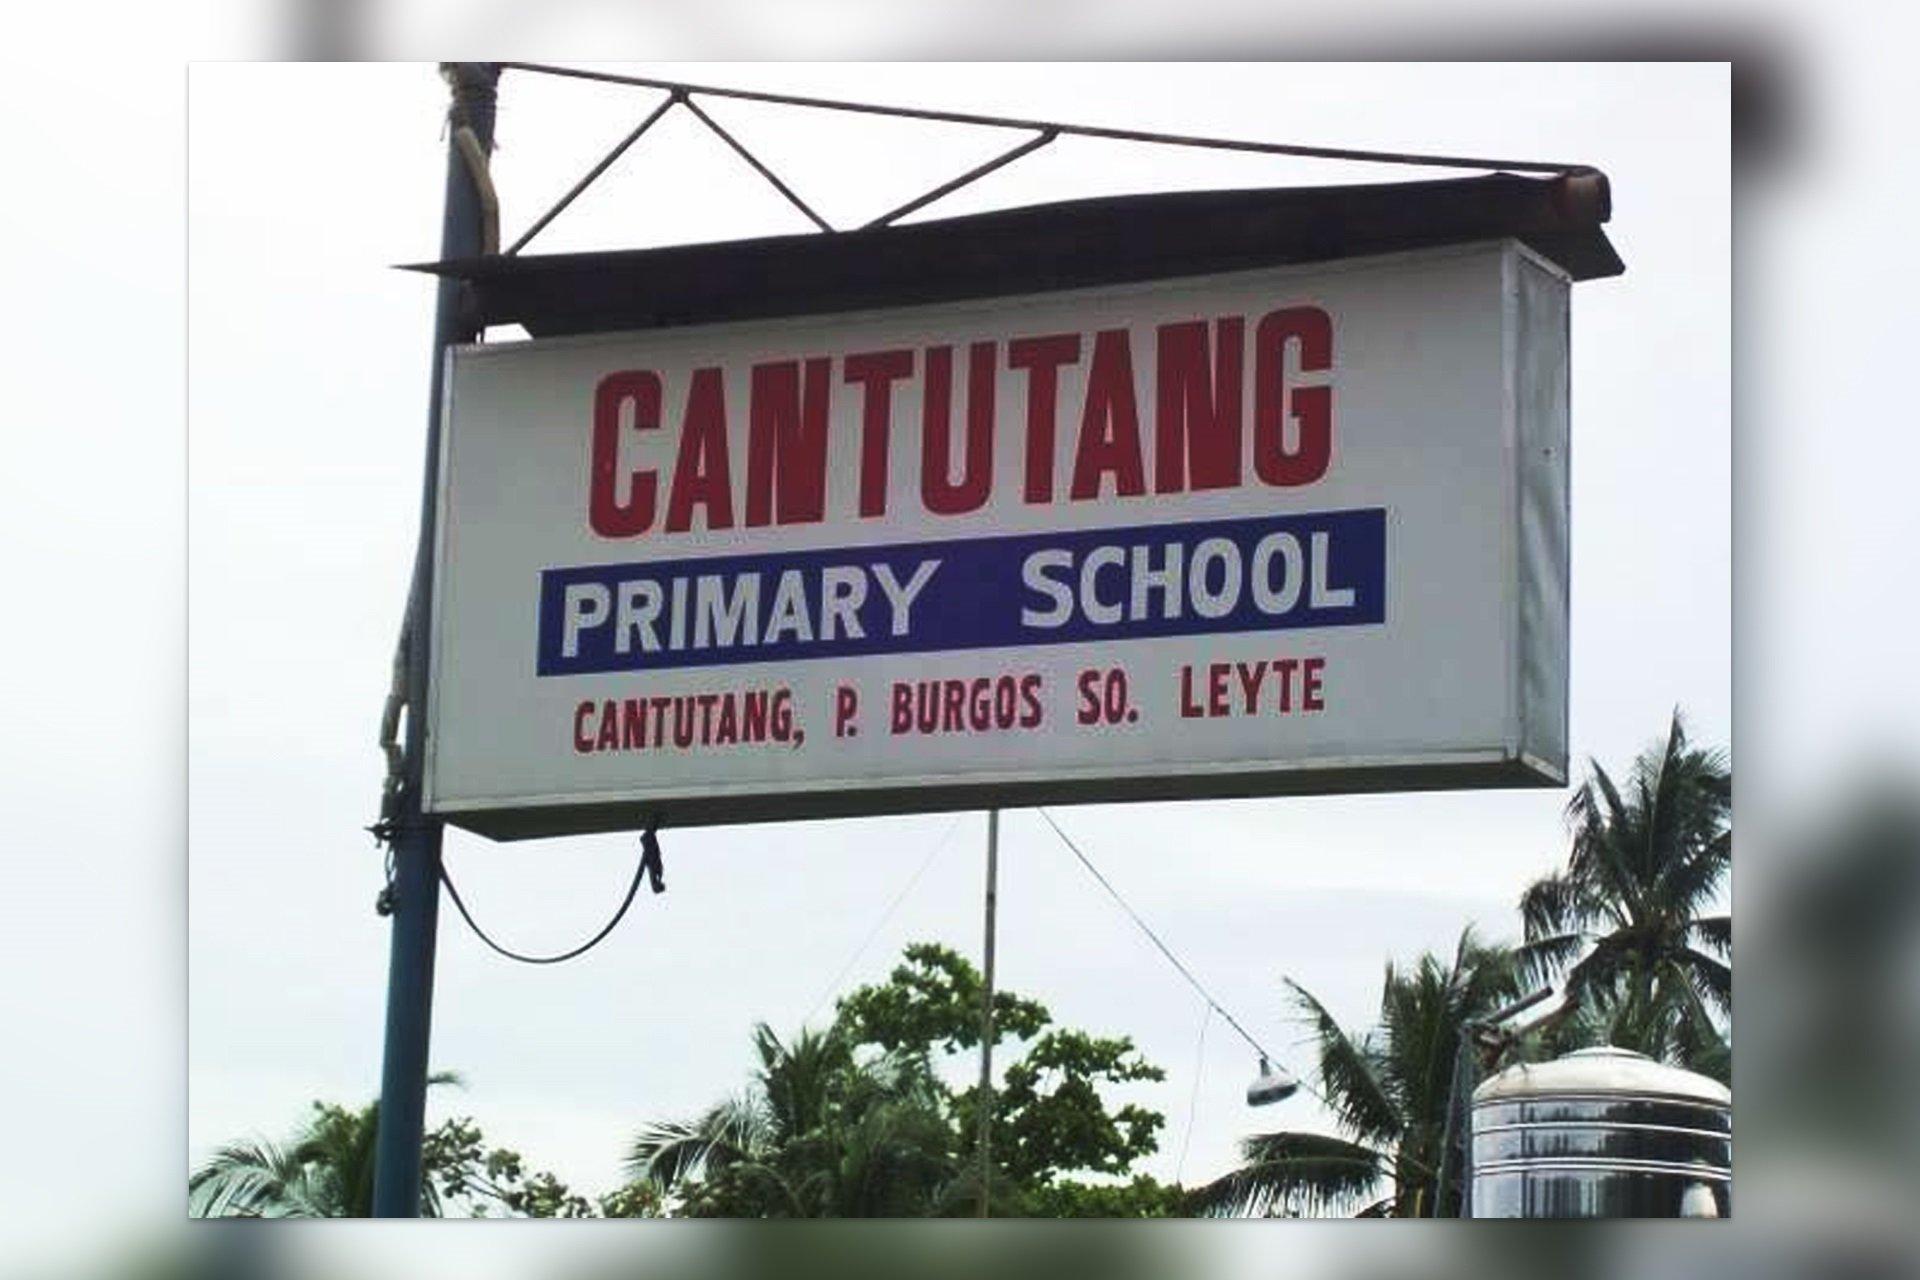 Cantutang Primary School